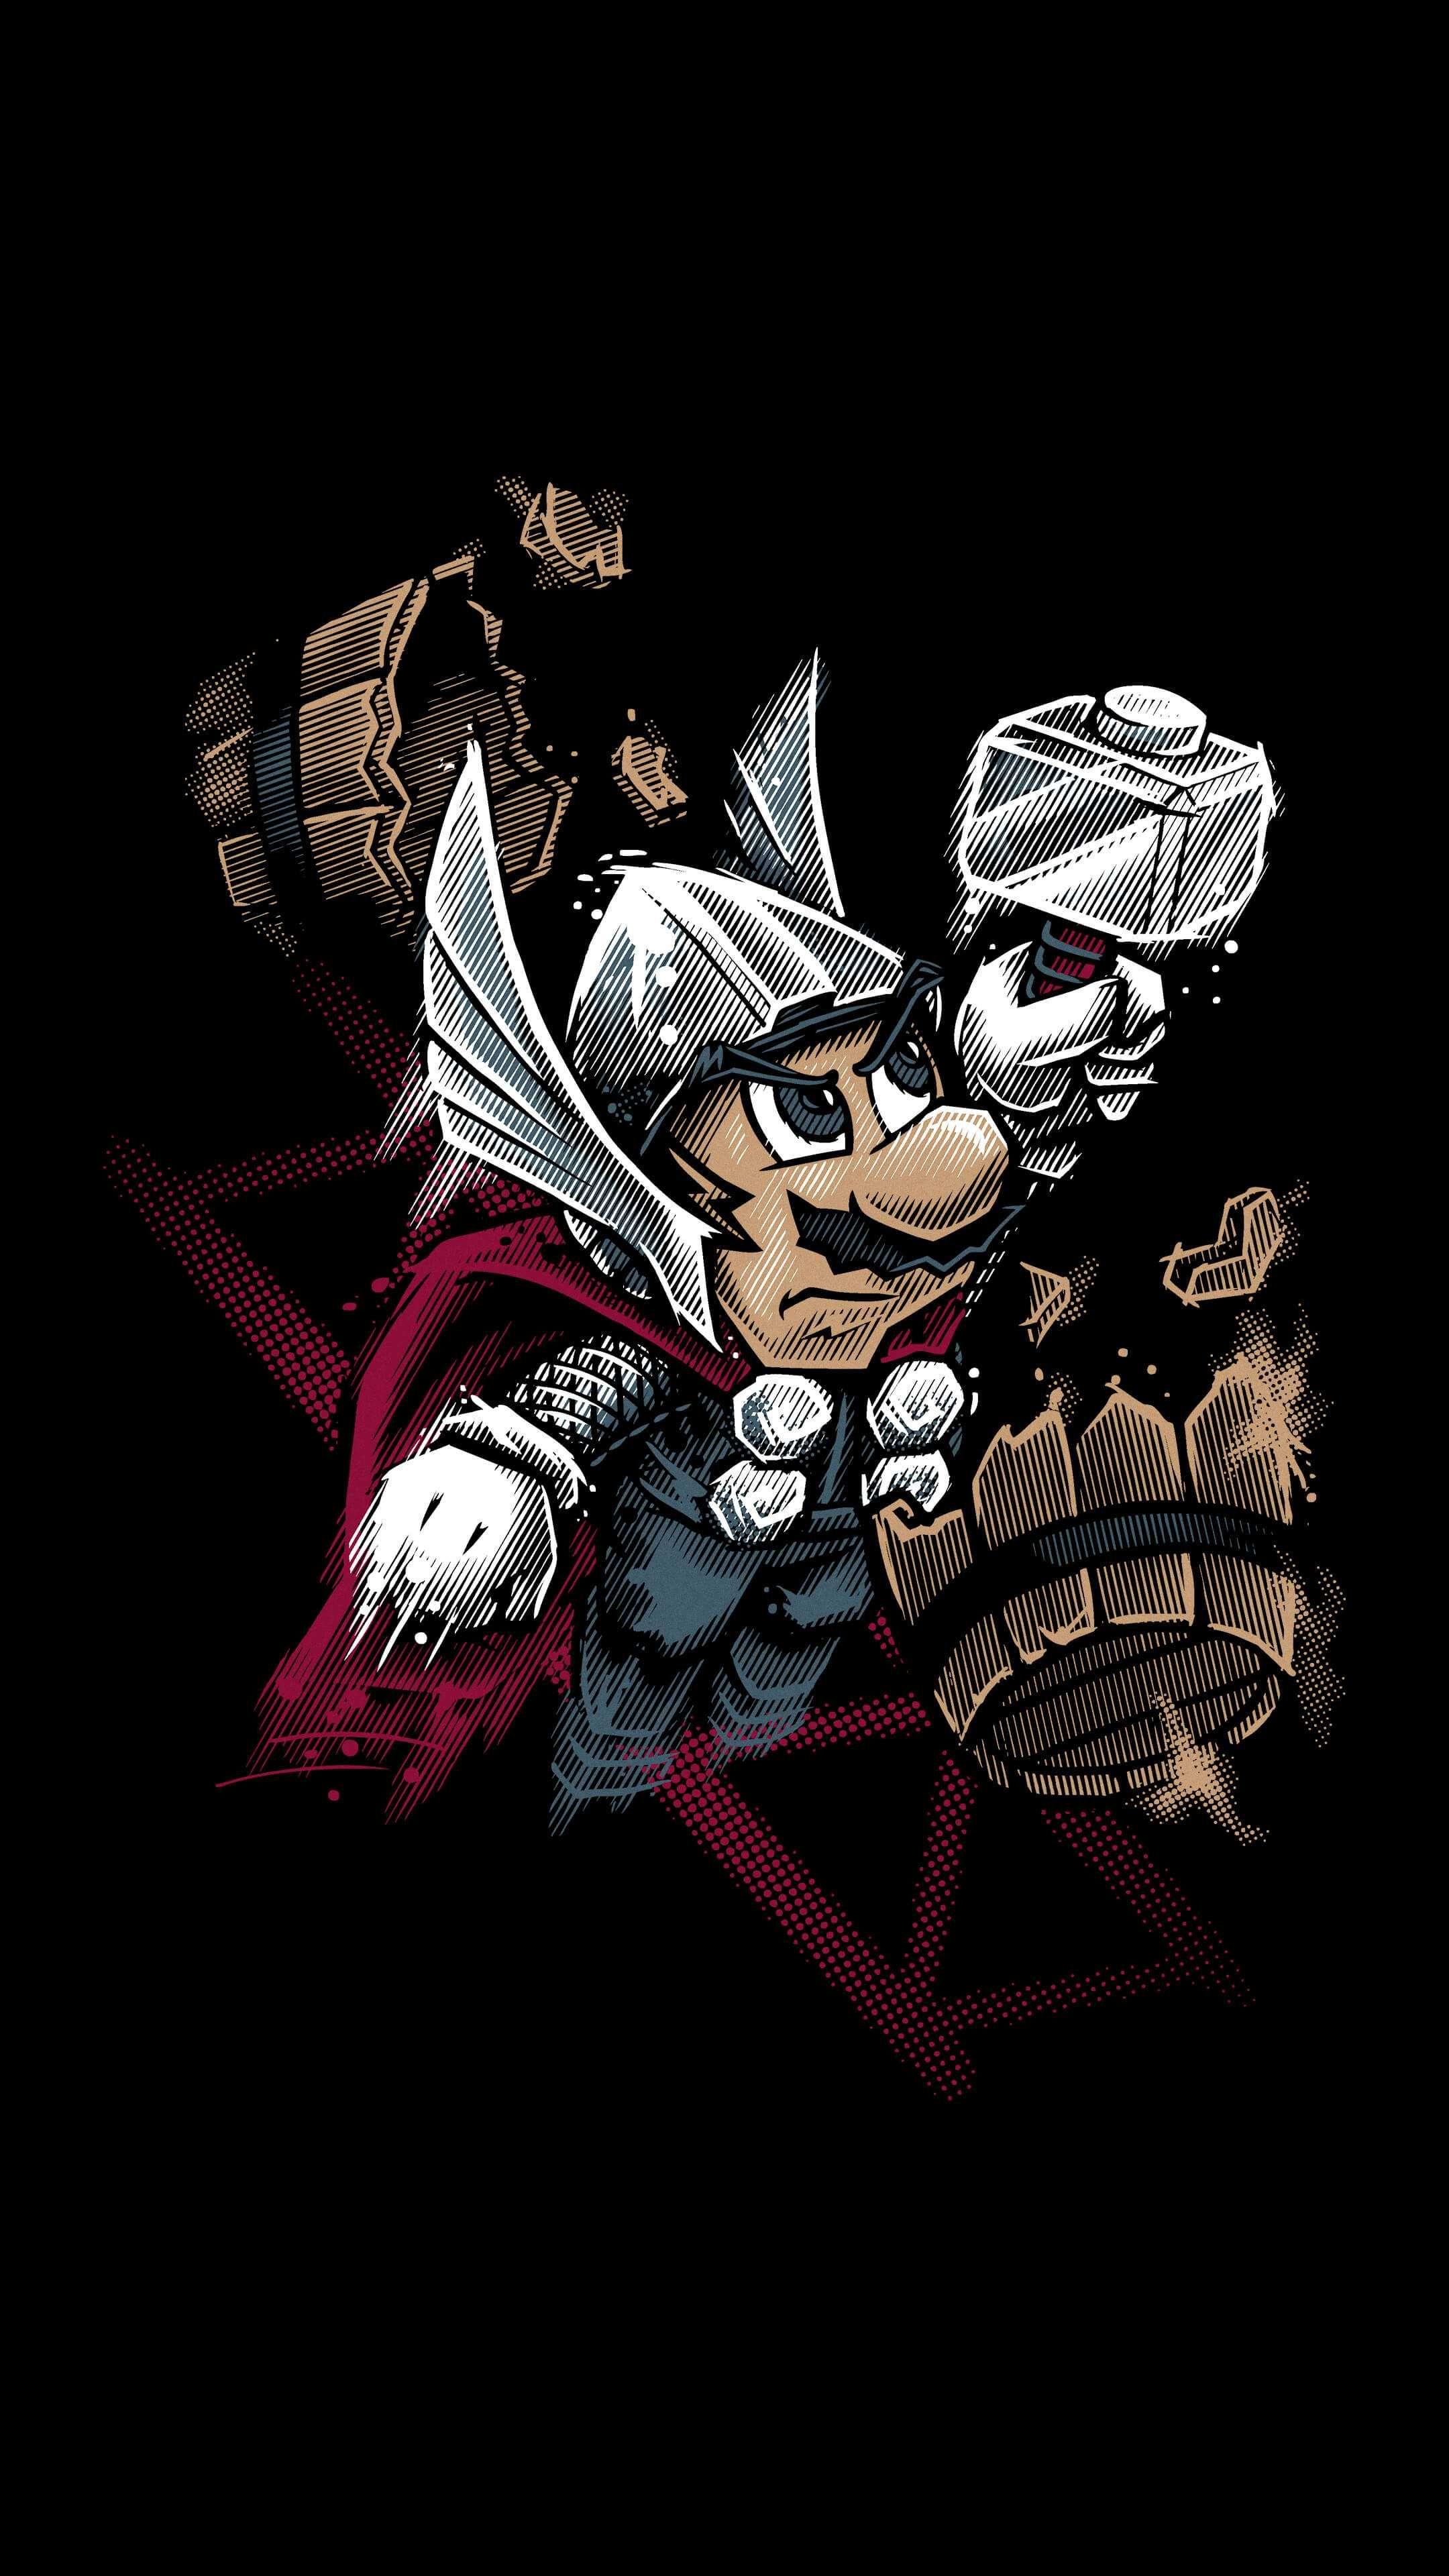 Super Mario Thor Iphone Wallpaper Gaming Wallpapers Thor